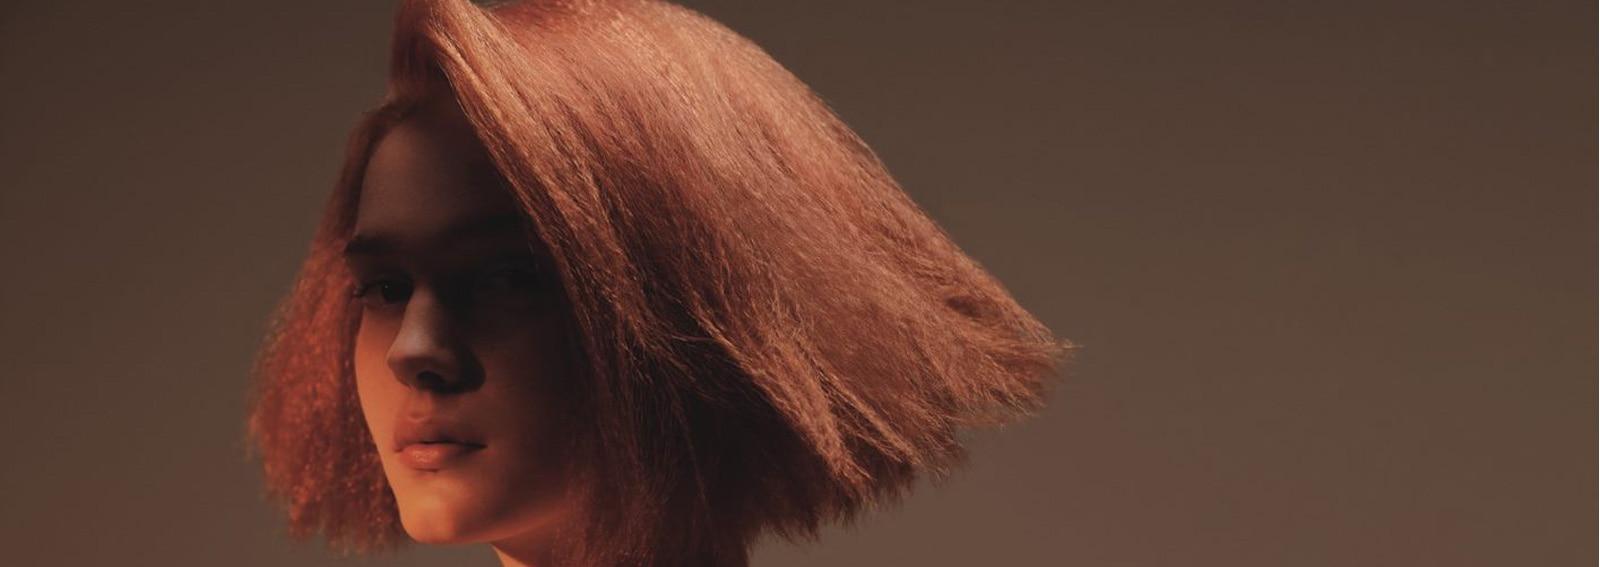 capelli-rossi-tendenza-primavera-estate-2021-gigi-hadid-cover-desktop